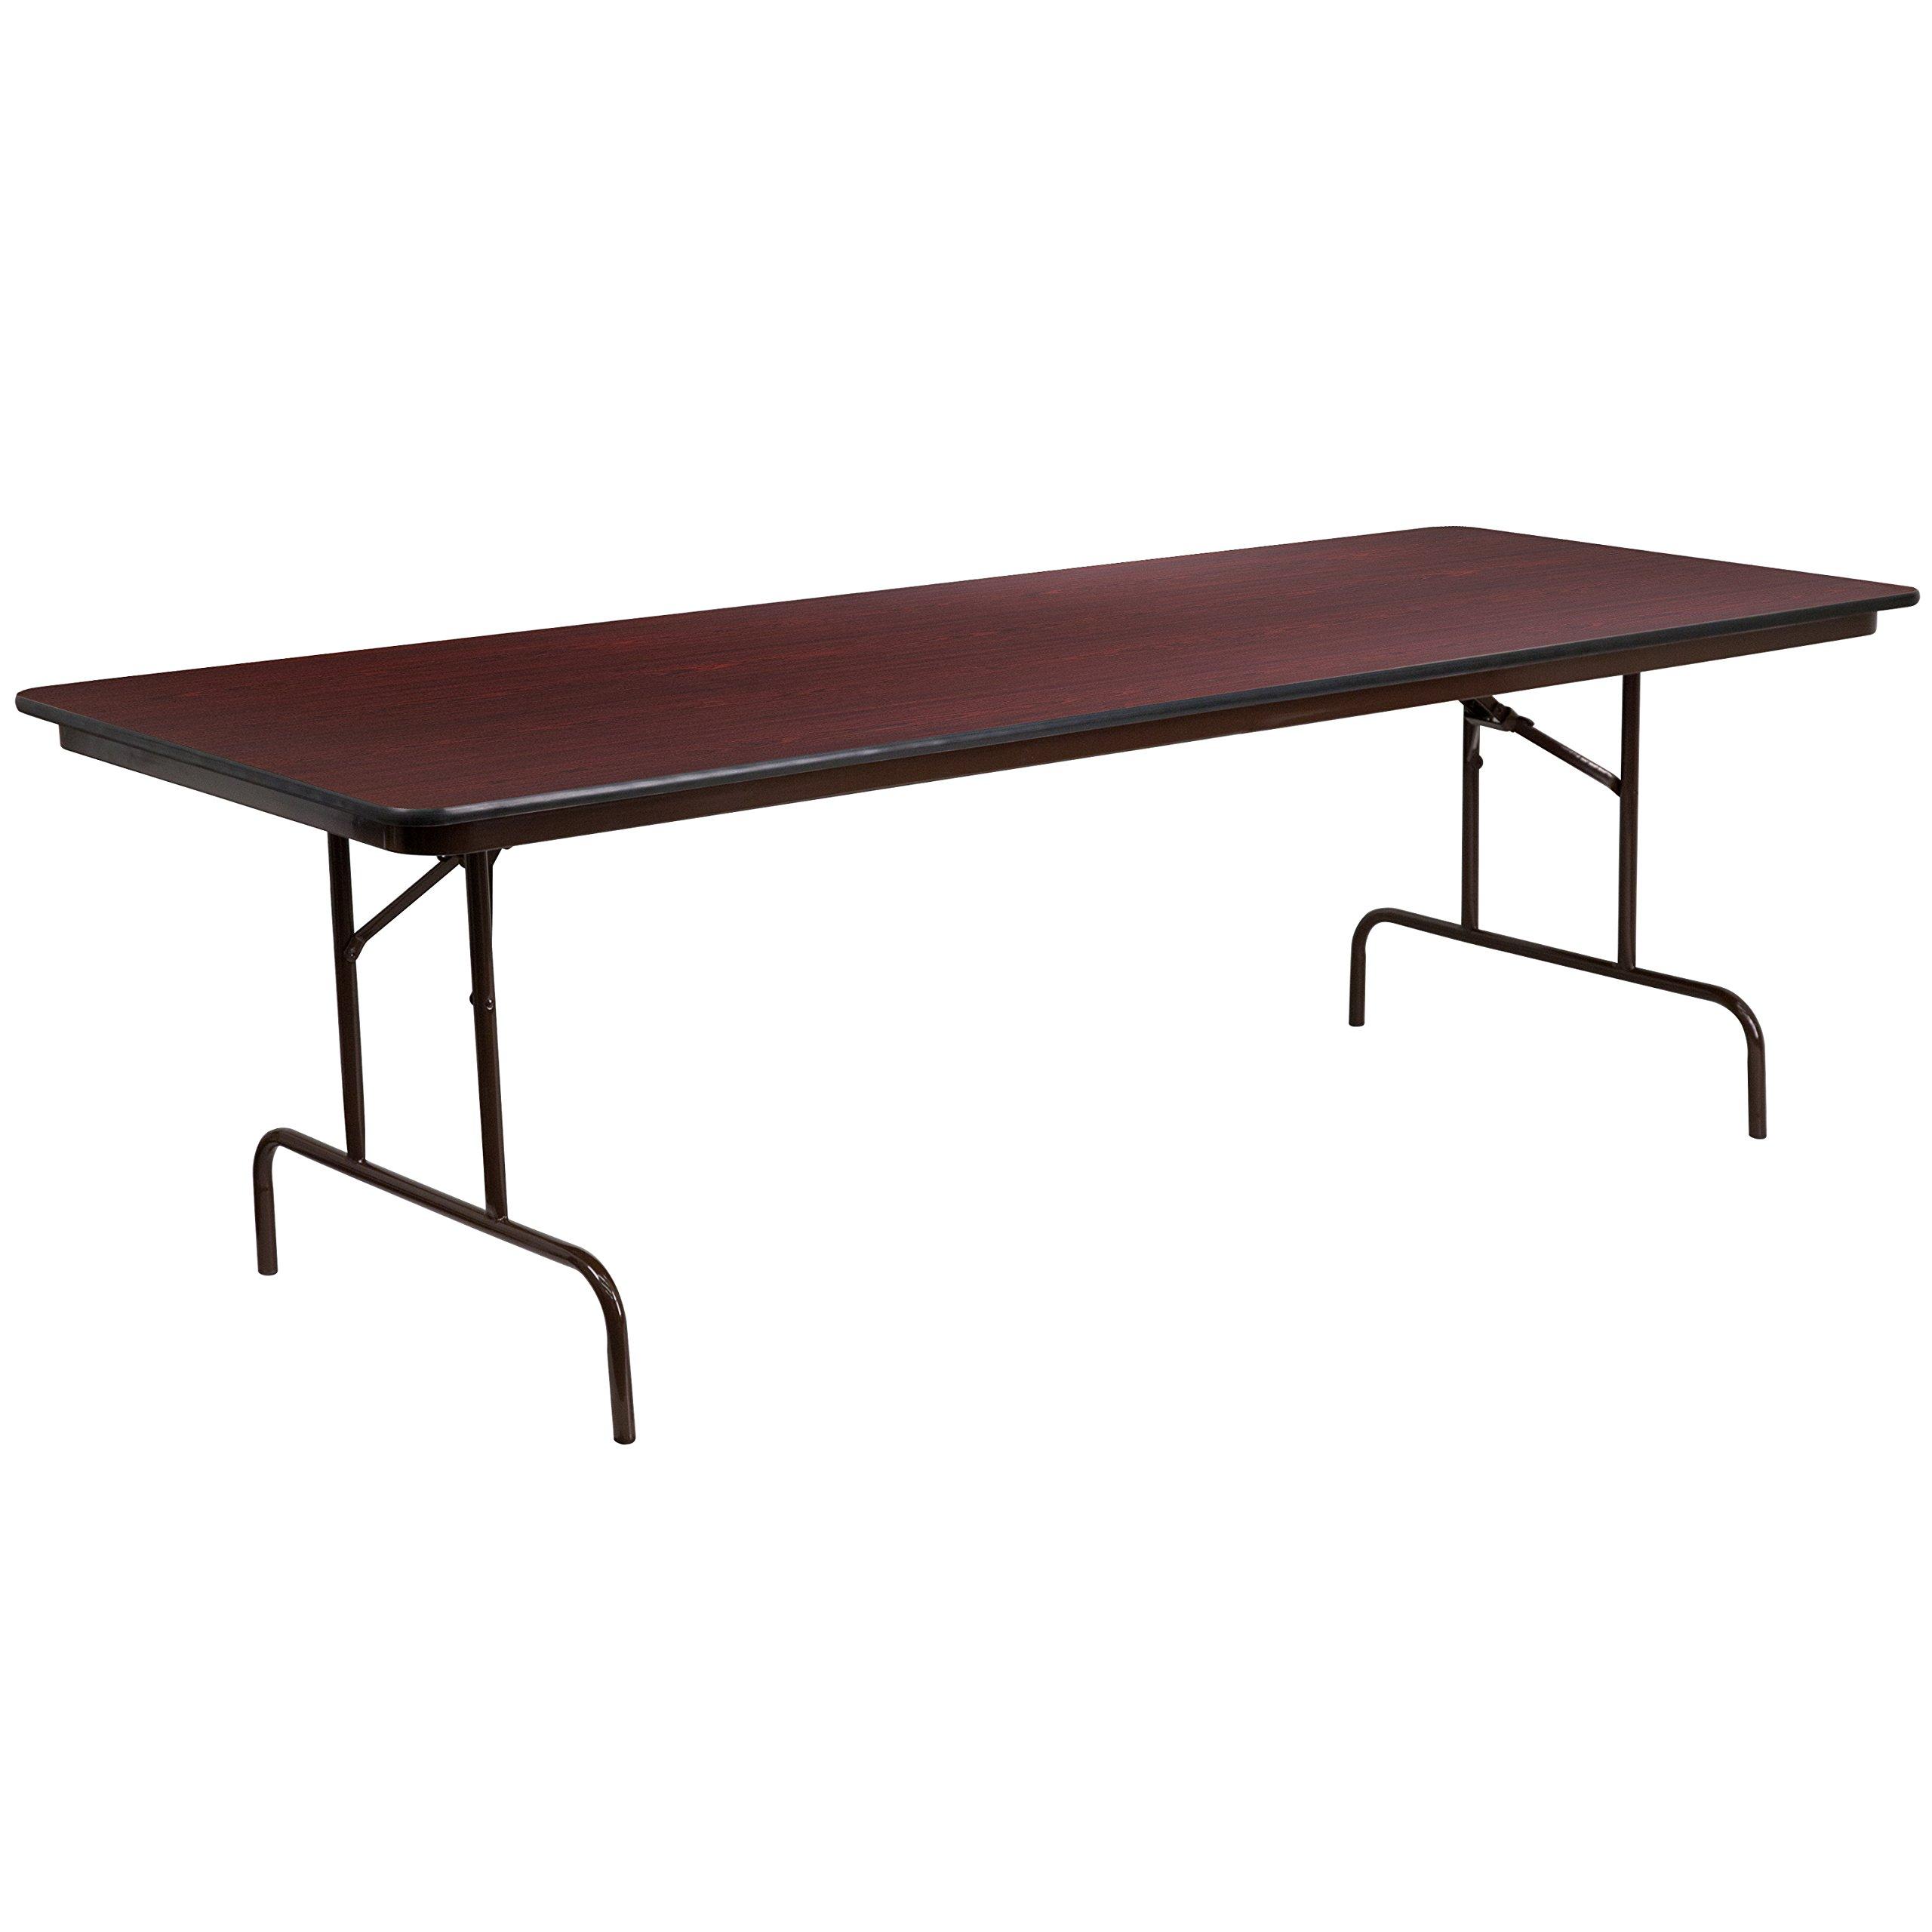 Flash Furniture 36'' x 96'' Rectangular High Pressure Mahogany Laminate Folding Banquet Table